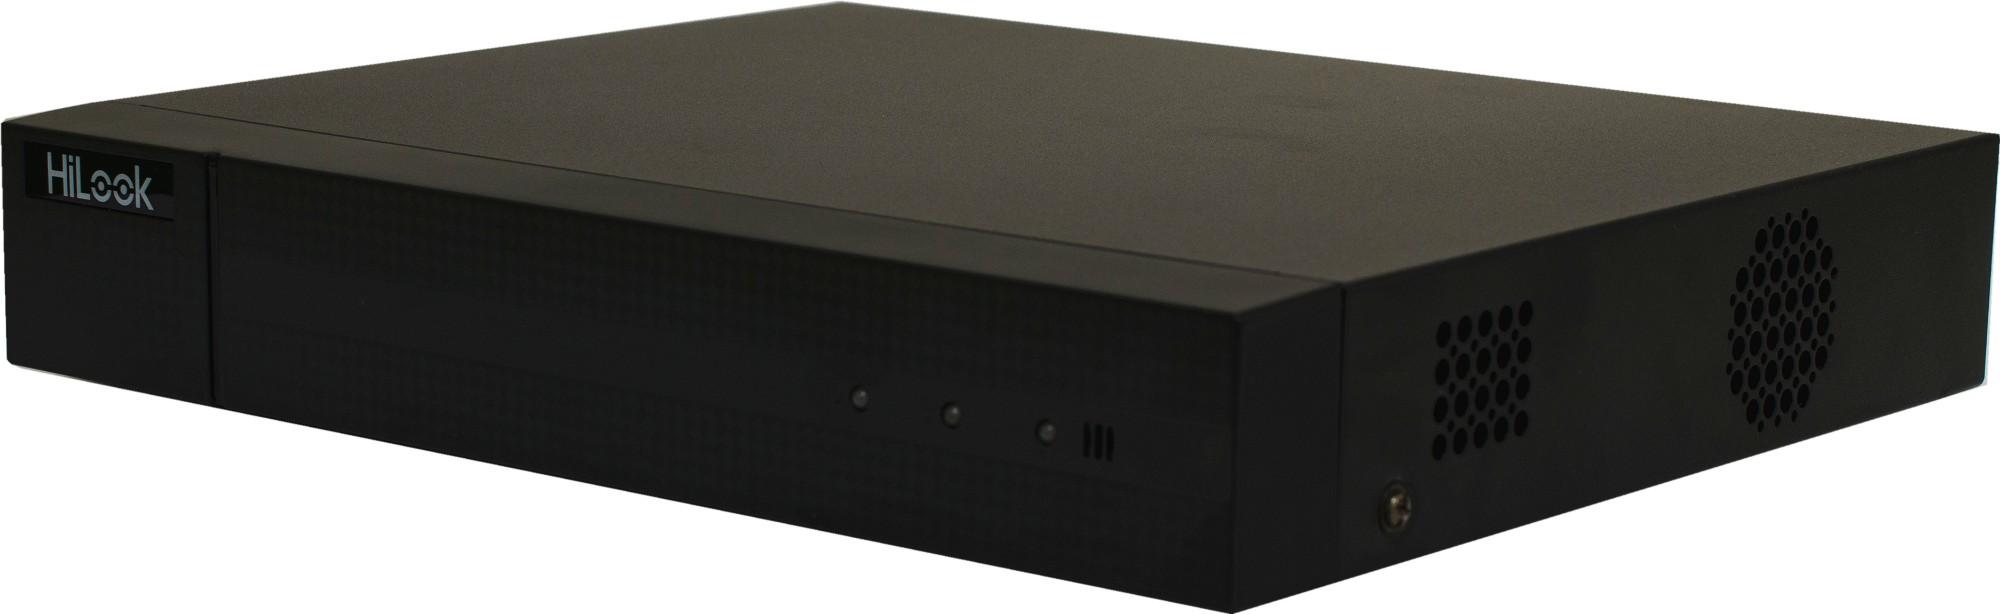 Hilook by Hikvision DVR-204U-K1 Ch 8MP 5MP 4MP 1080P HD-TVI Hybrid CCTV DVR Recorder - NO HDD